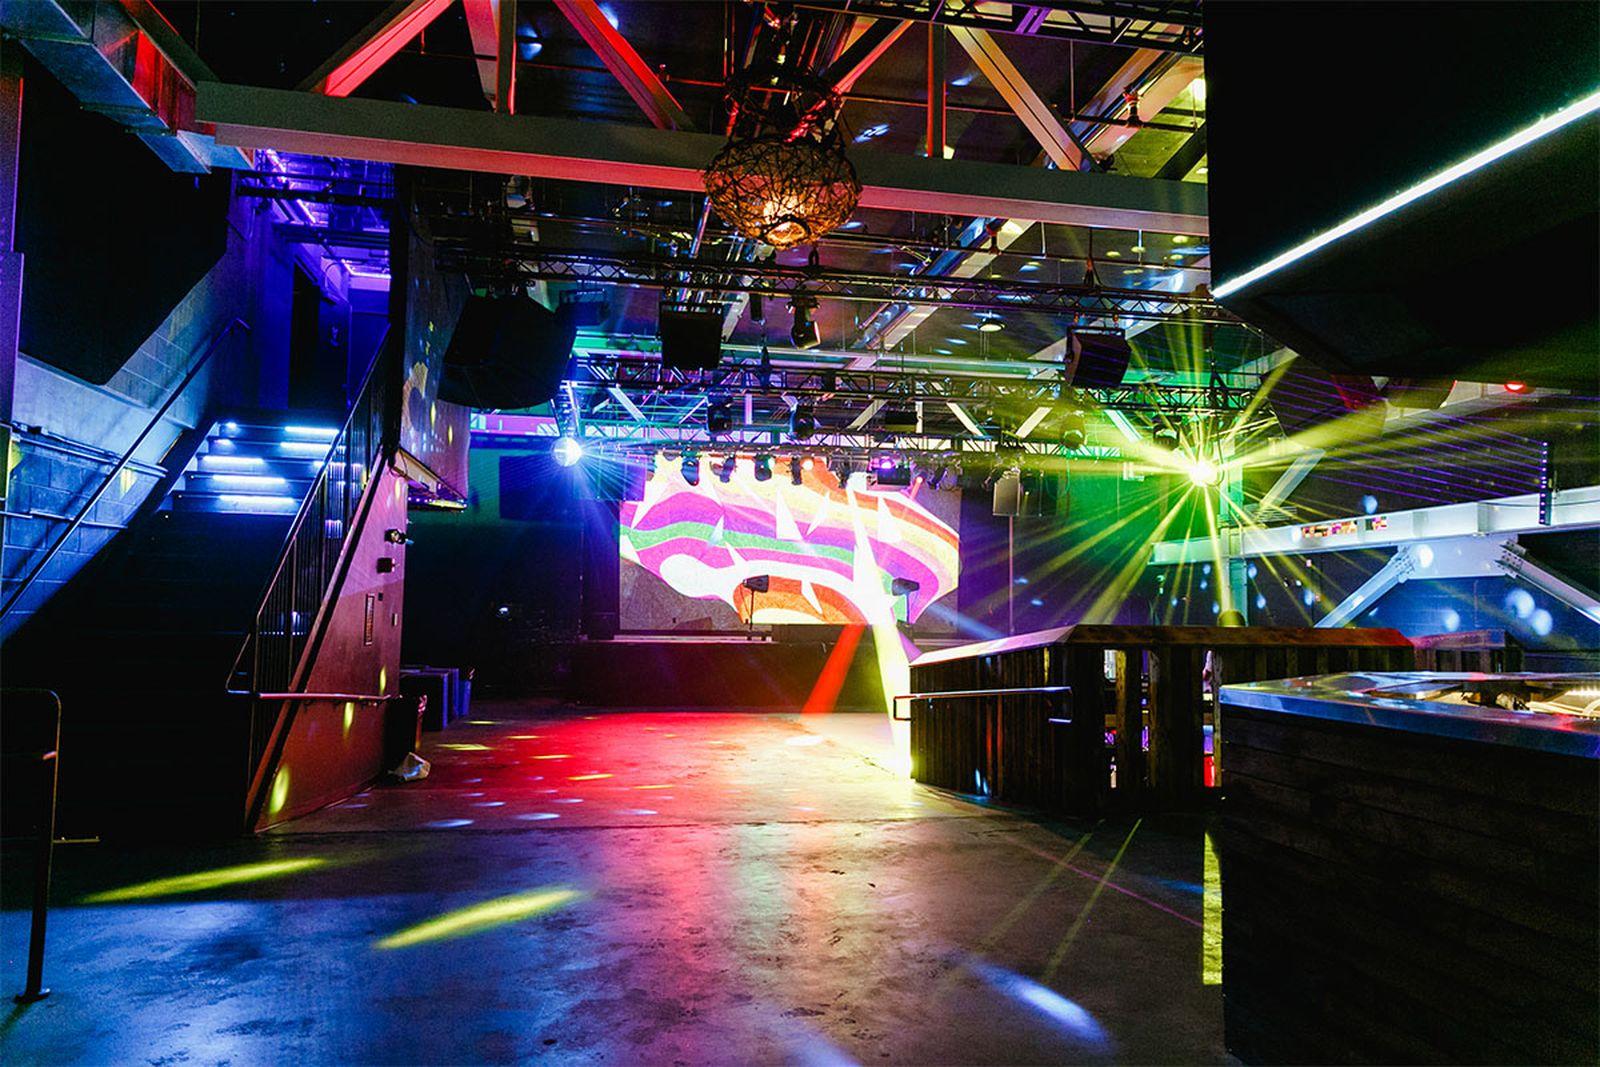 nyc music venues elsewhere AMEX american express platinum new york